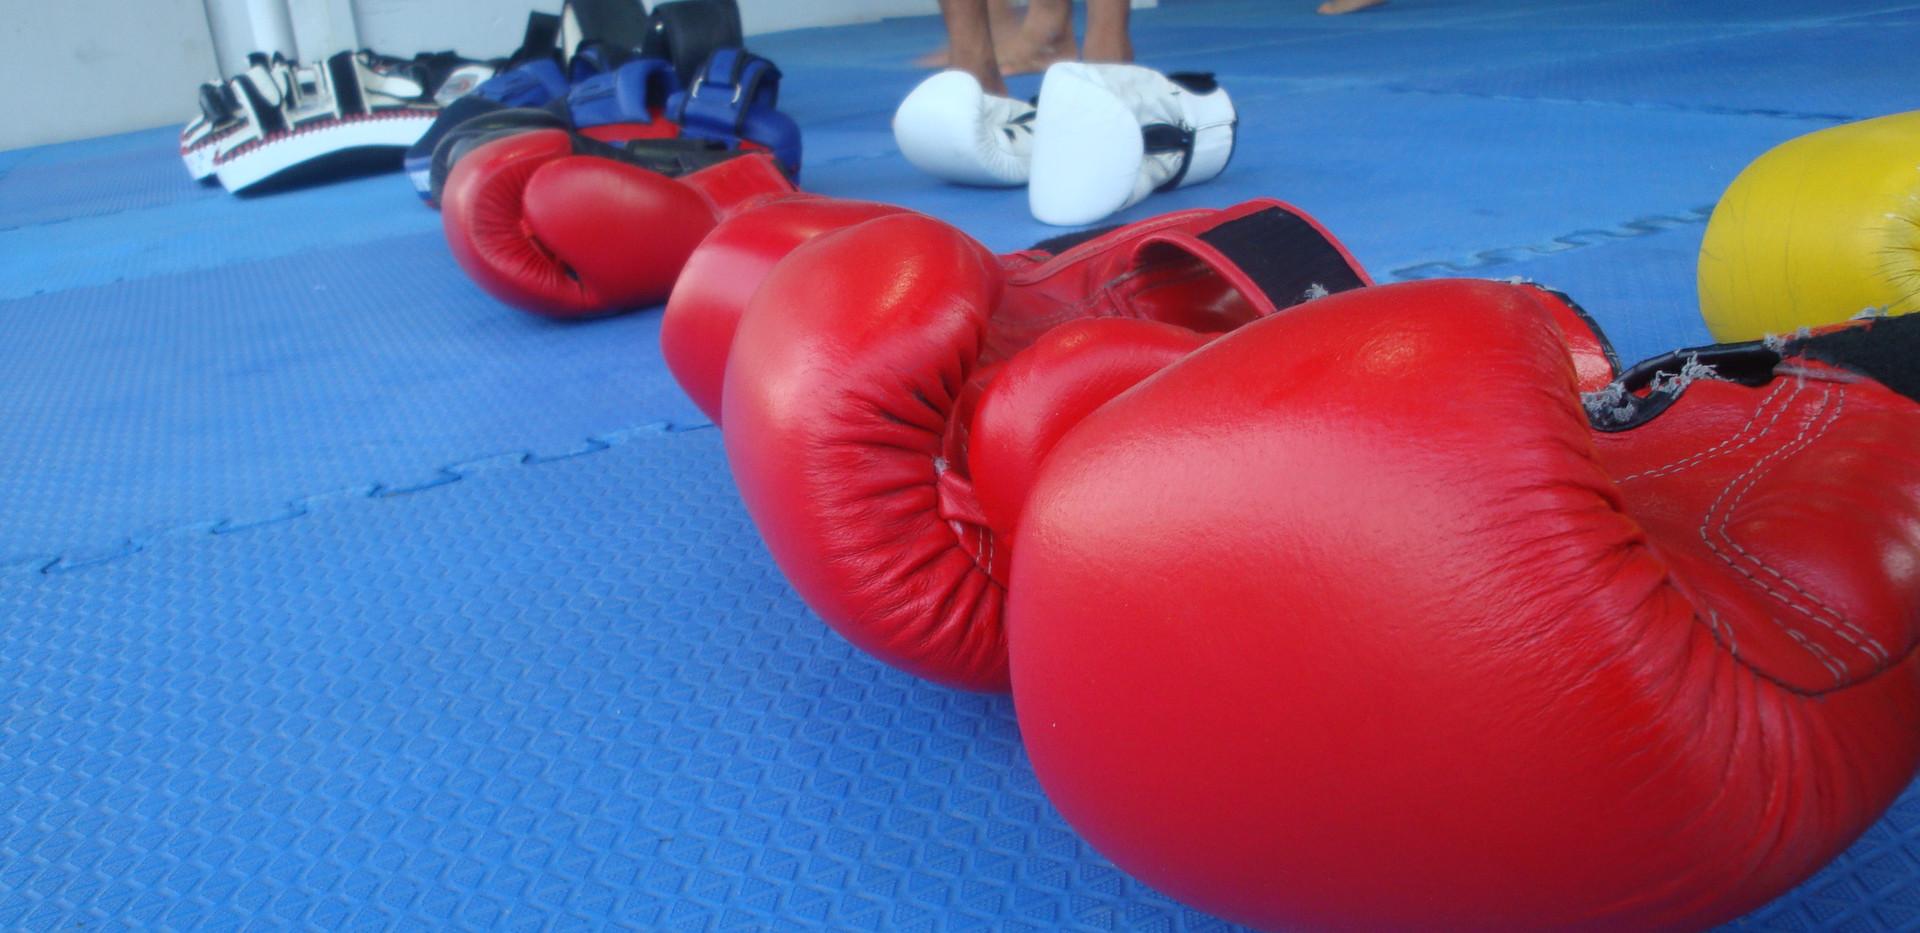 Boxign glove